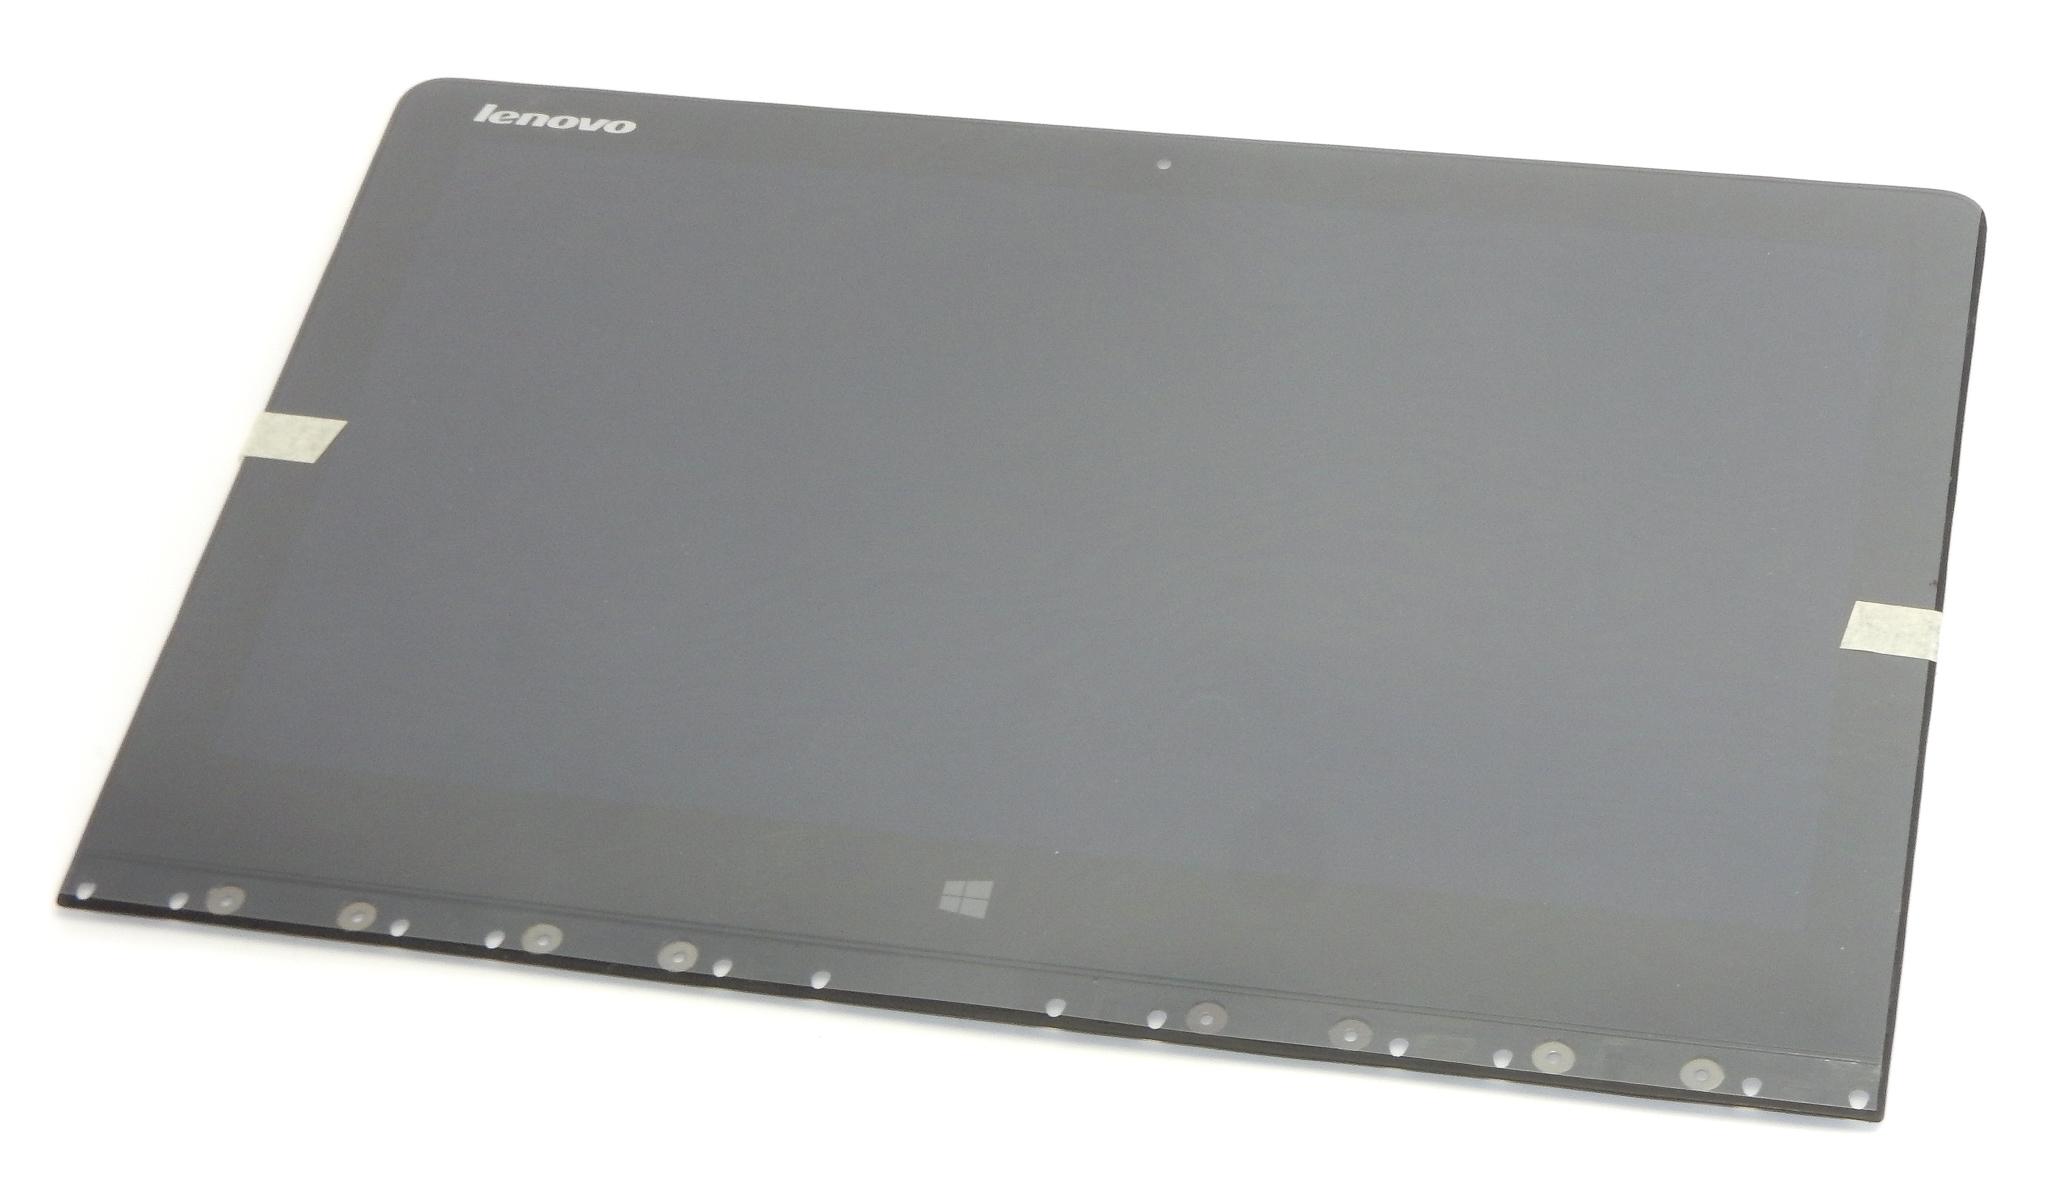 Lenovo 5D10F76130 IdeaPad Yoga 3 Pro 1370 LCD Touch Screen Assembly